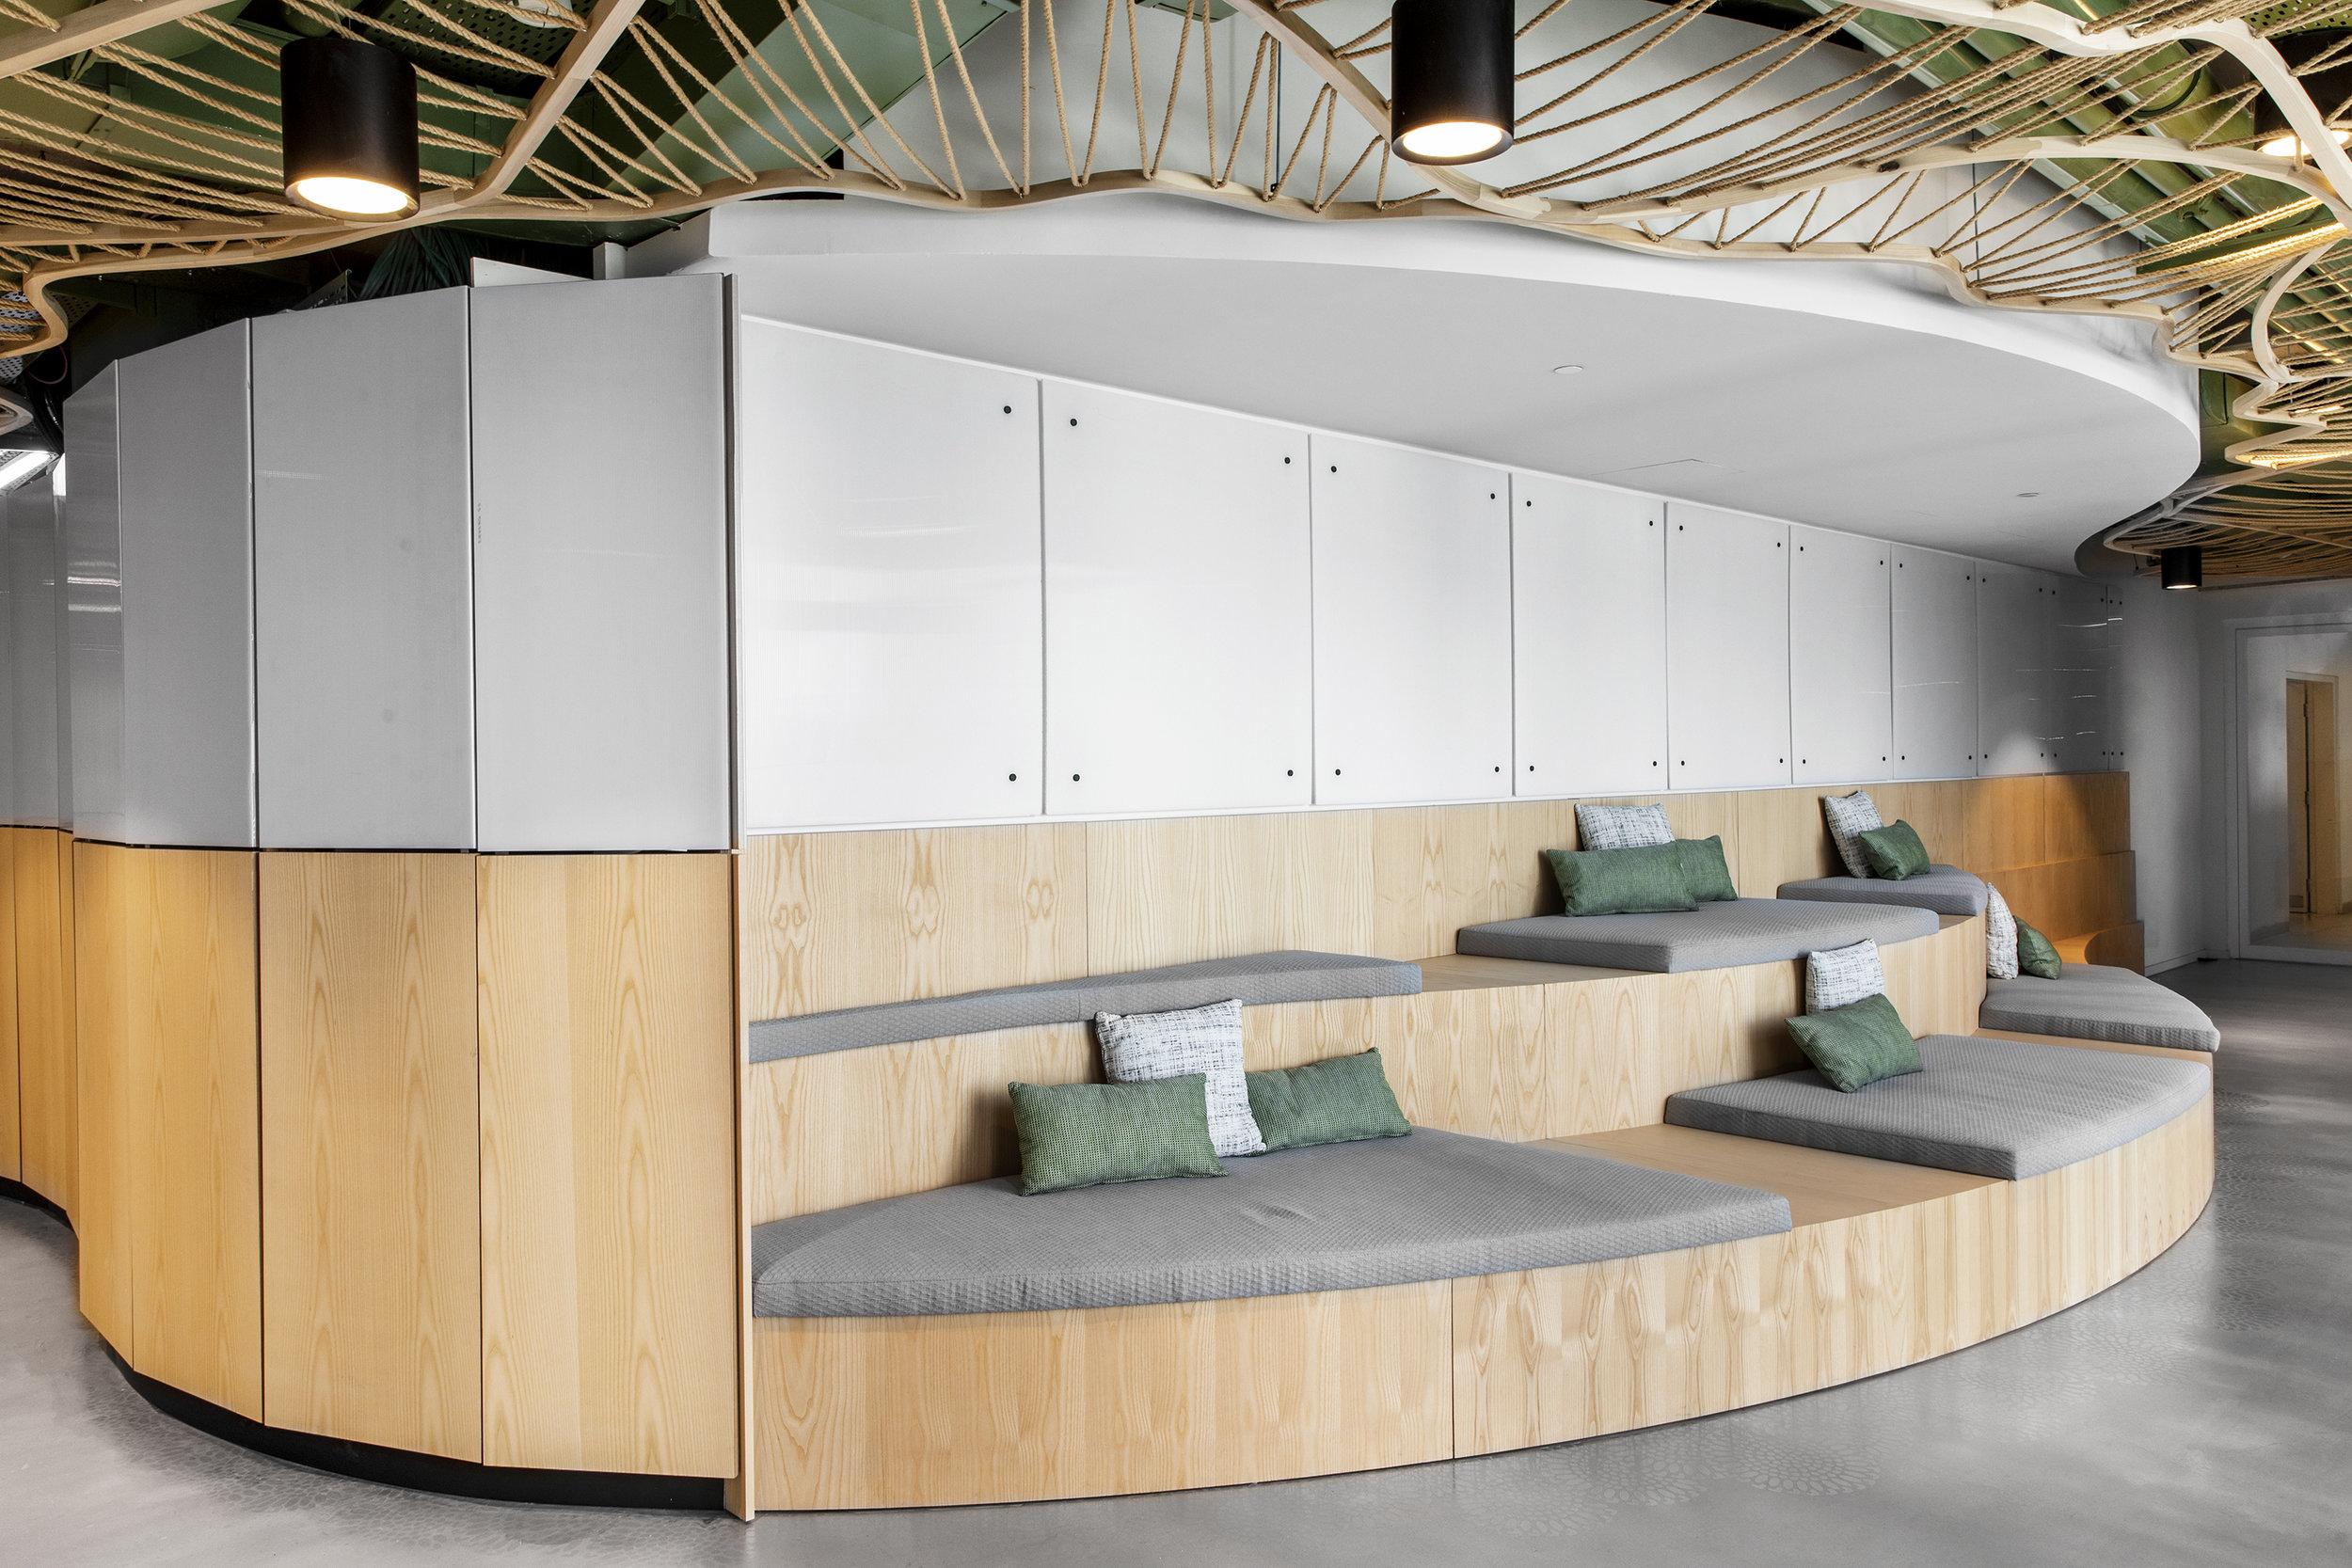 HINNOMAN - ROY DAVID ARCHTECTURE - STUDIO - סטודיו רואי דוד - אדריכלים (32).jpg